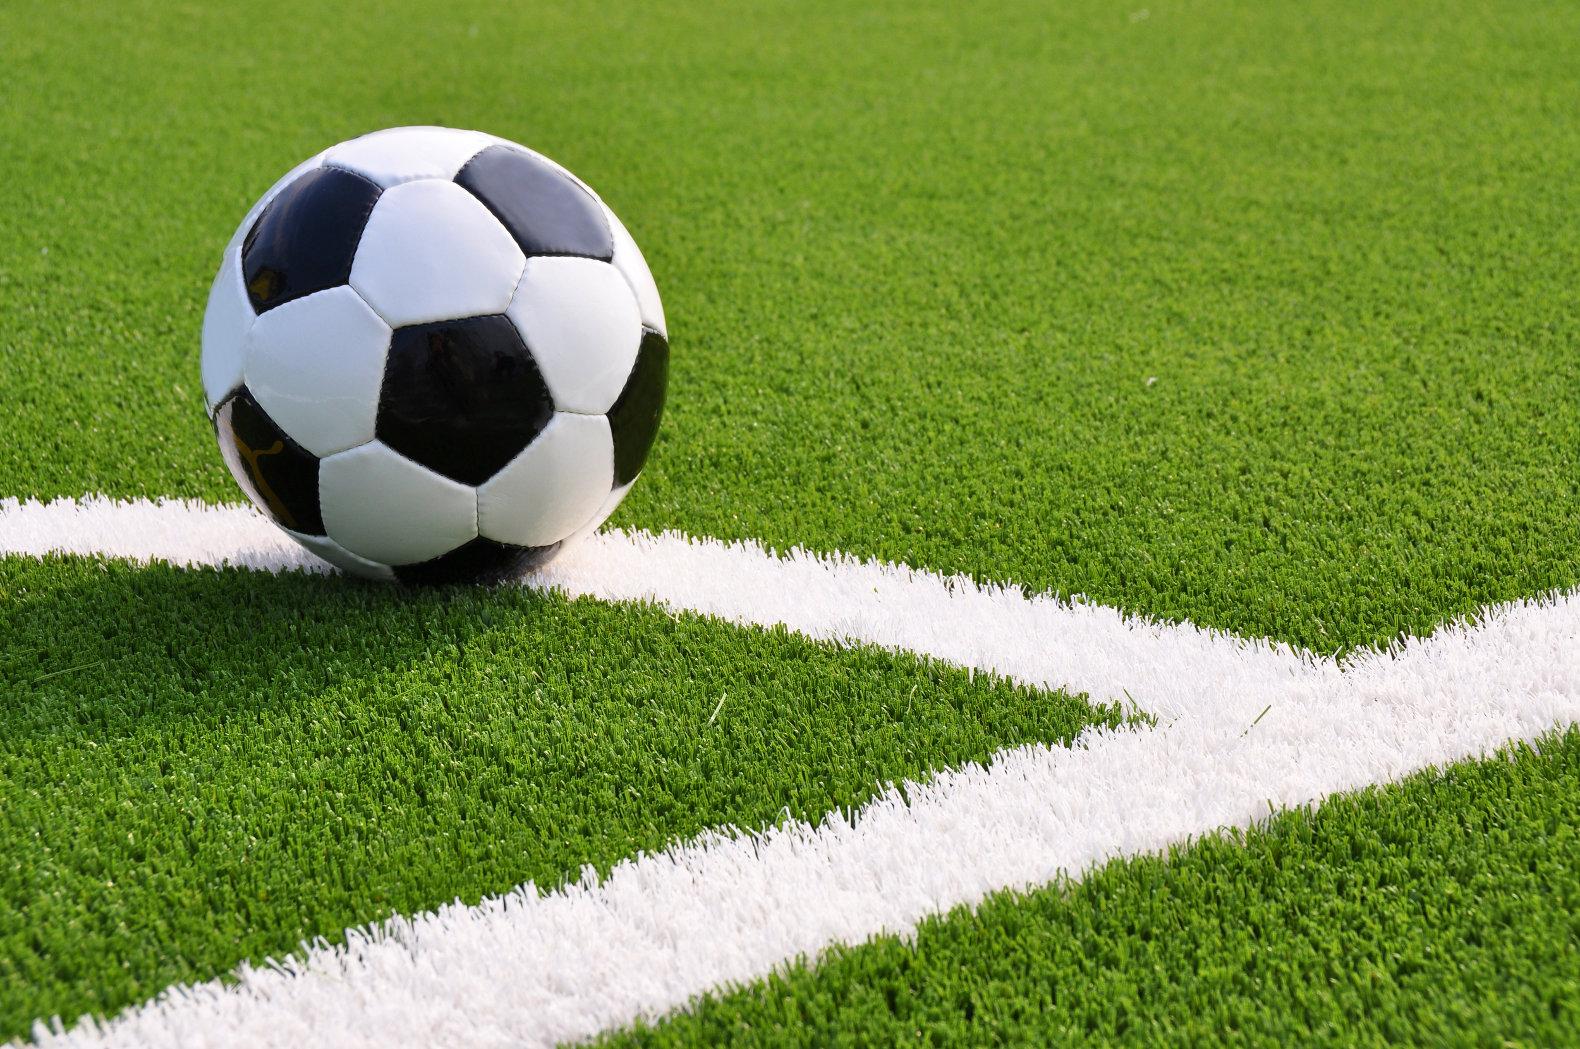 artificial turf on soccer fields